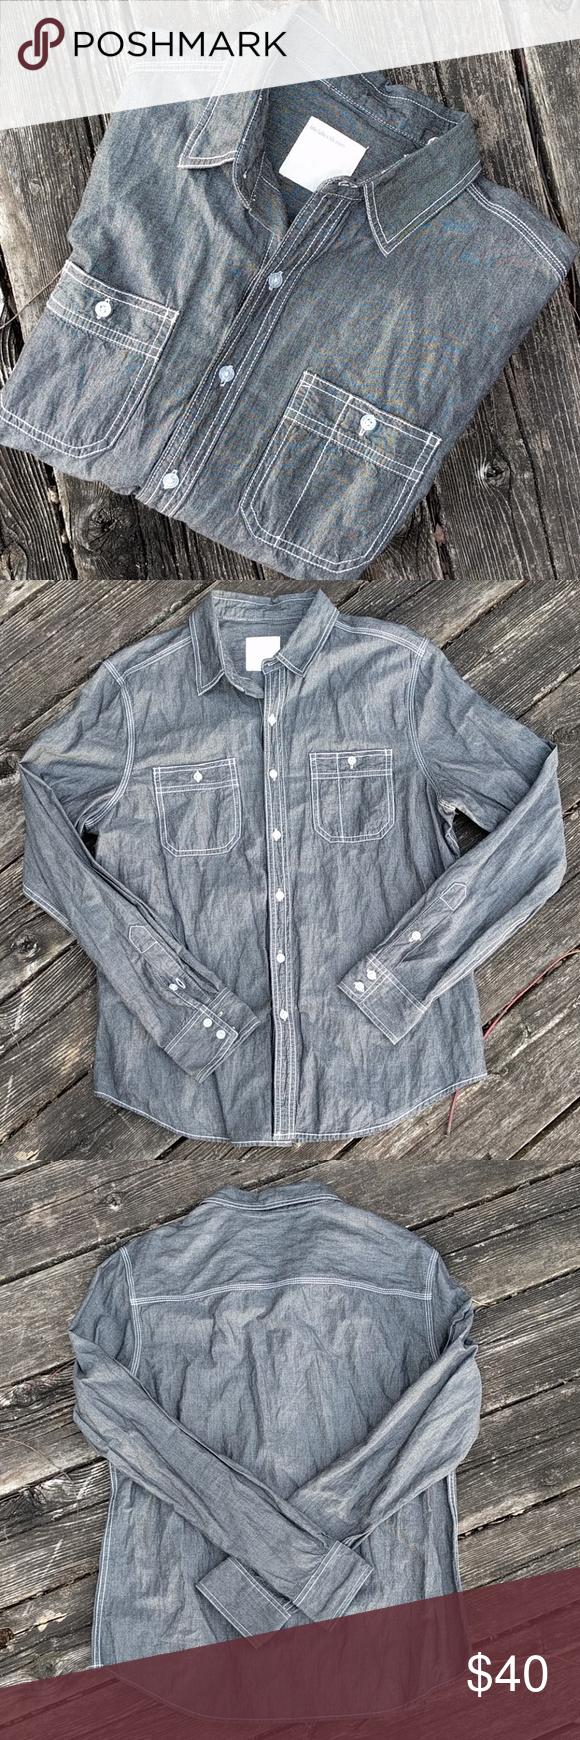 74439e93423 Life After Denim Gray Chambray Button-Down Shirt M